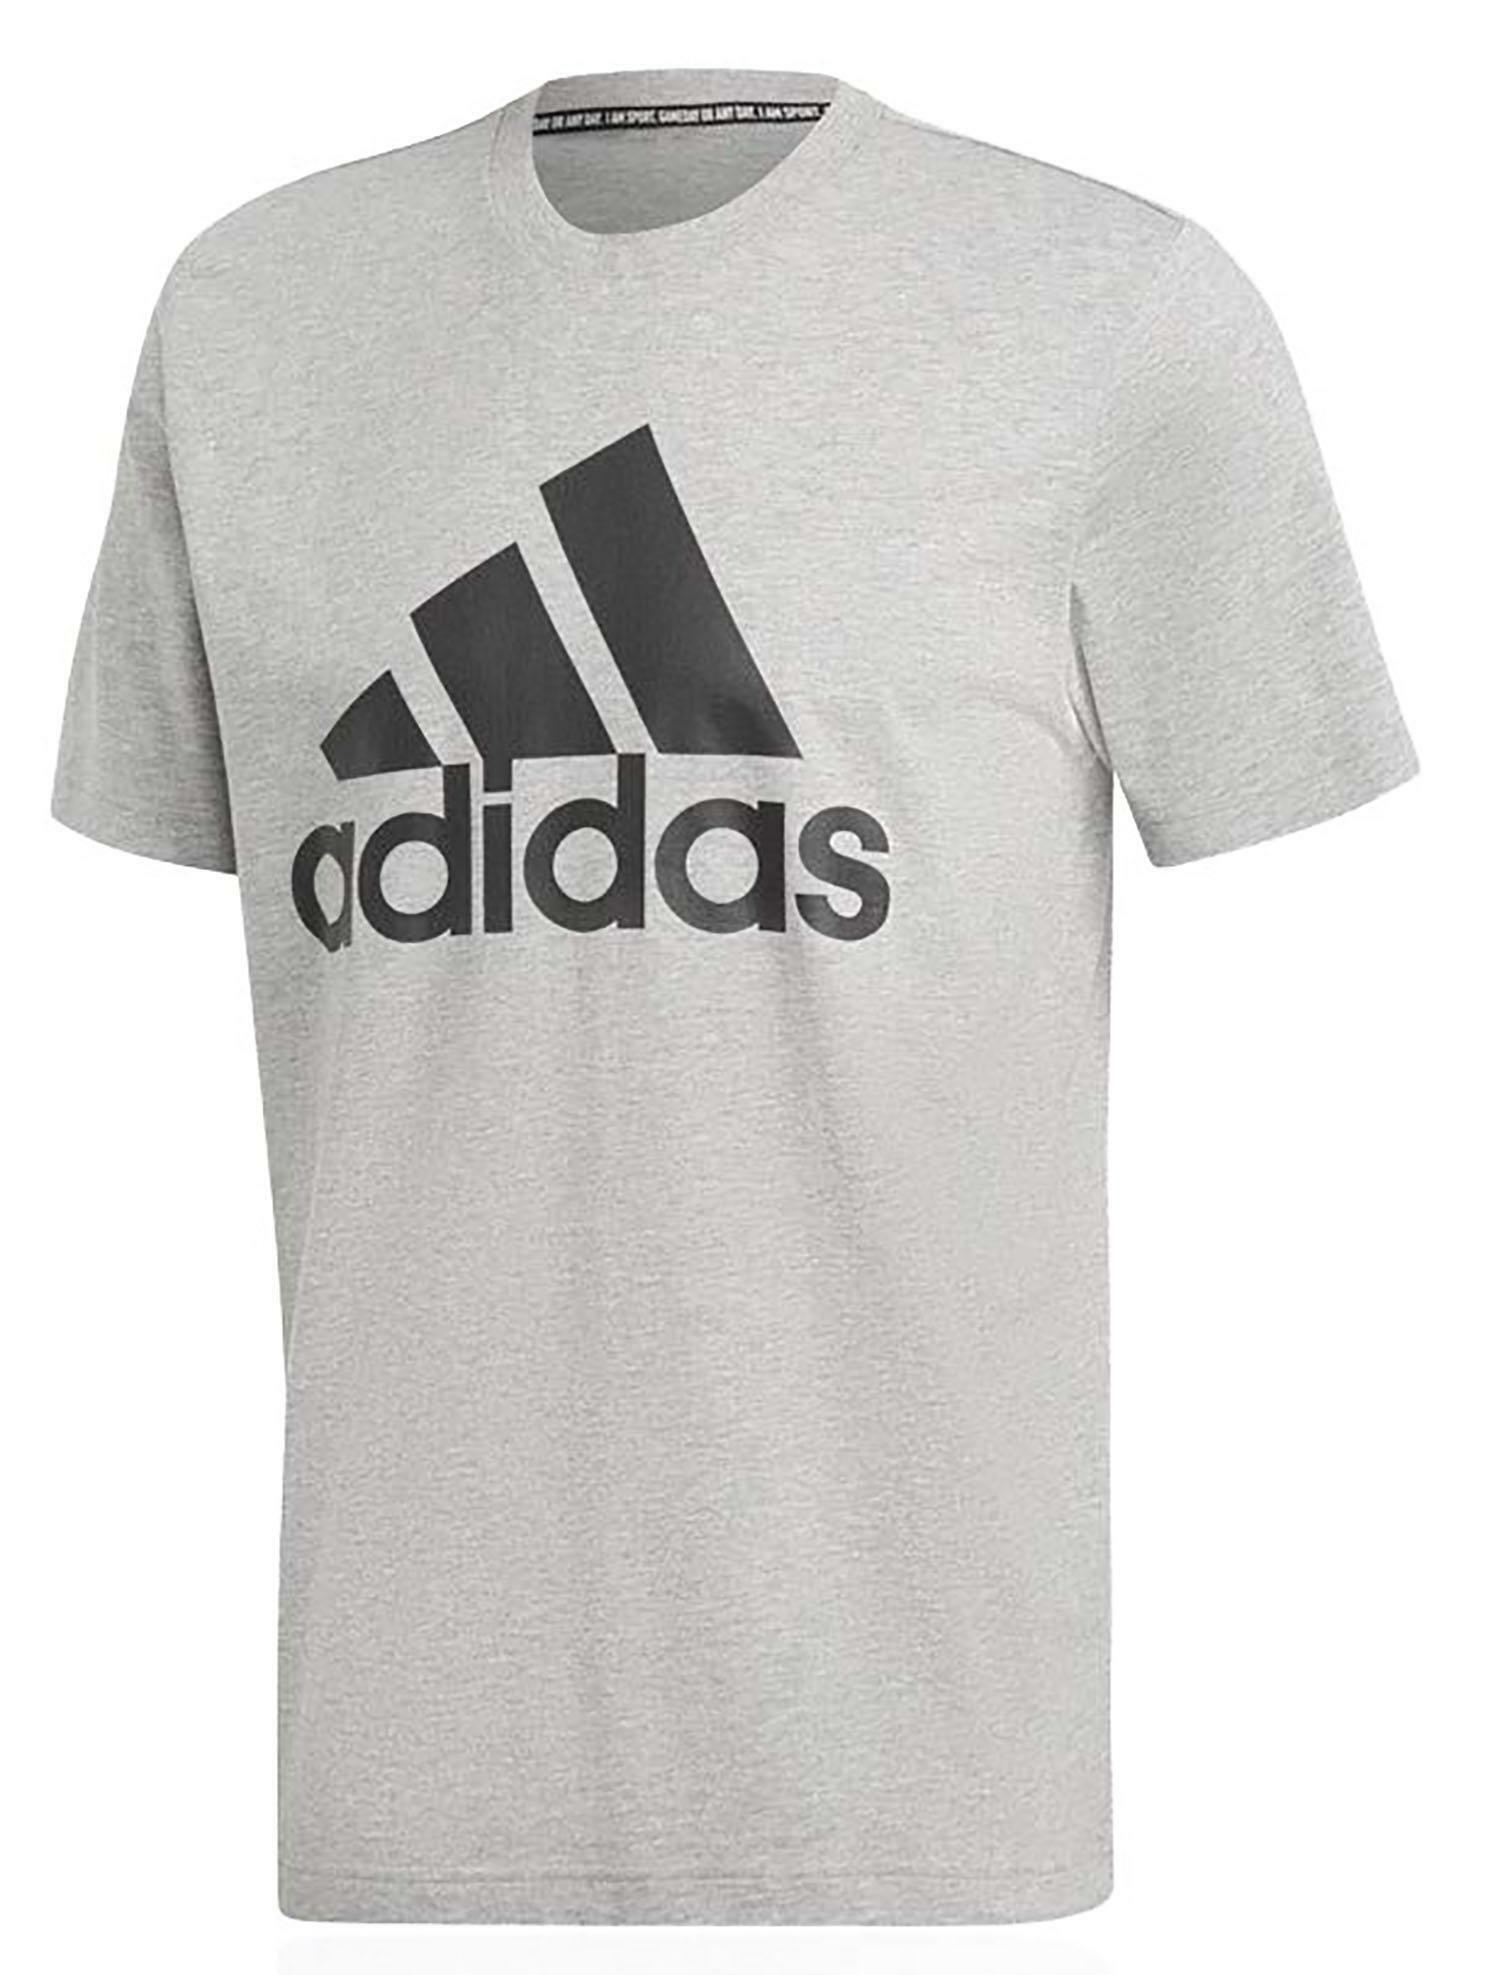 adidas mh bos tee t-shirt uomo grigia dt9930